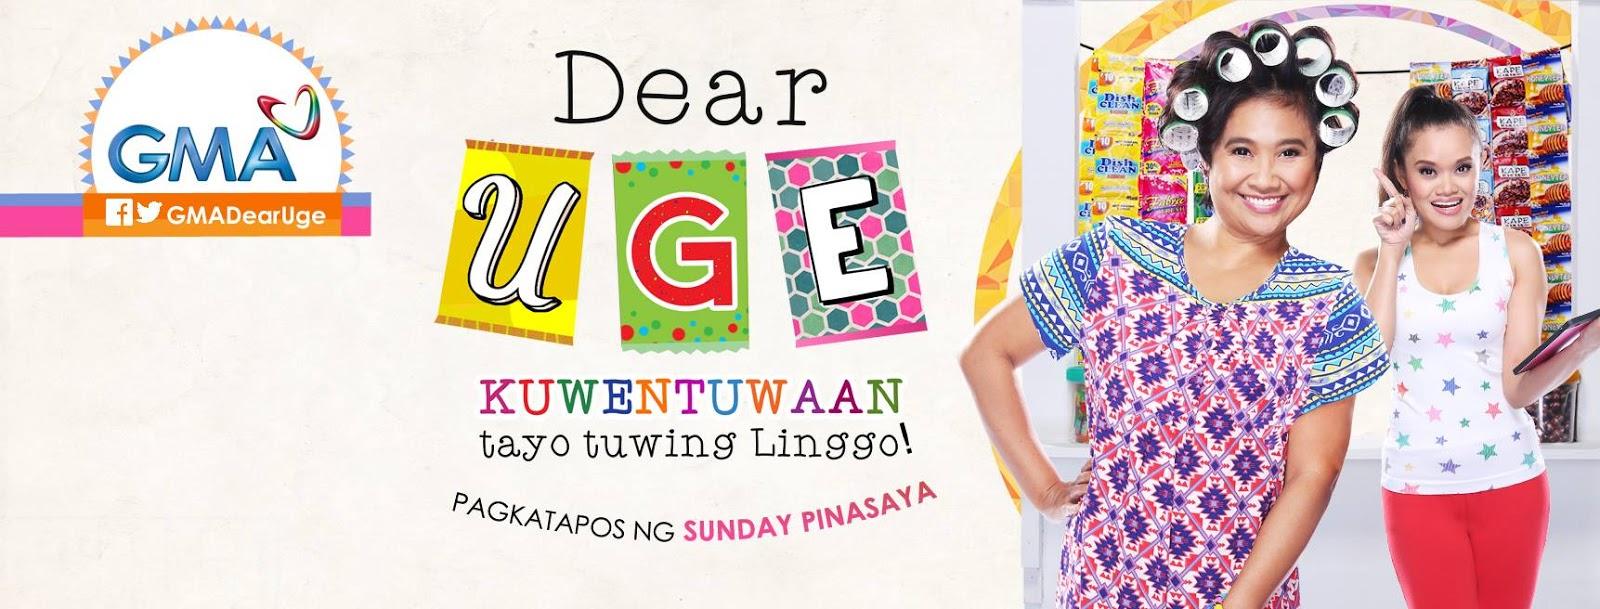 Dear Uge March 19 2017